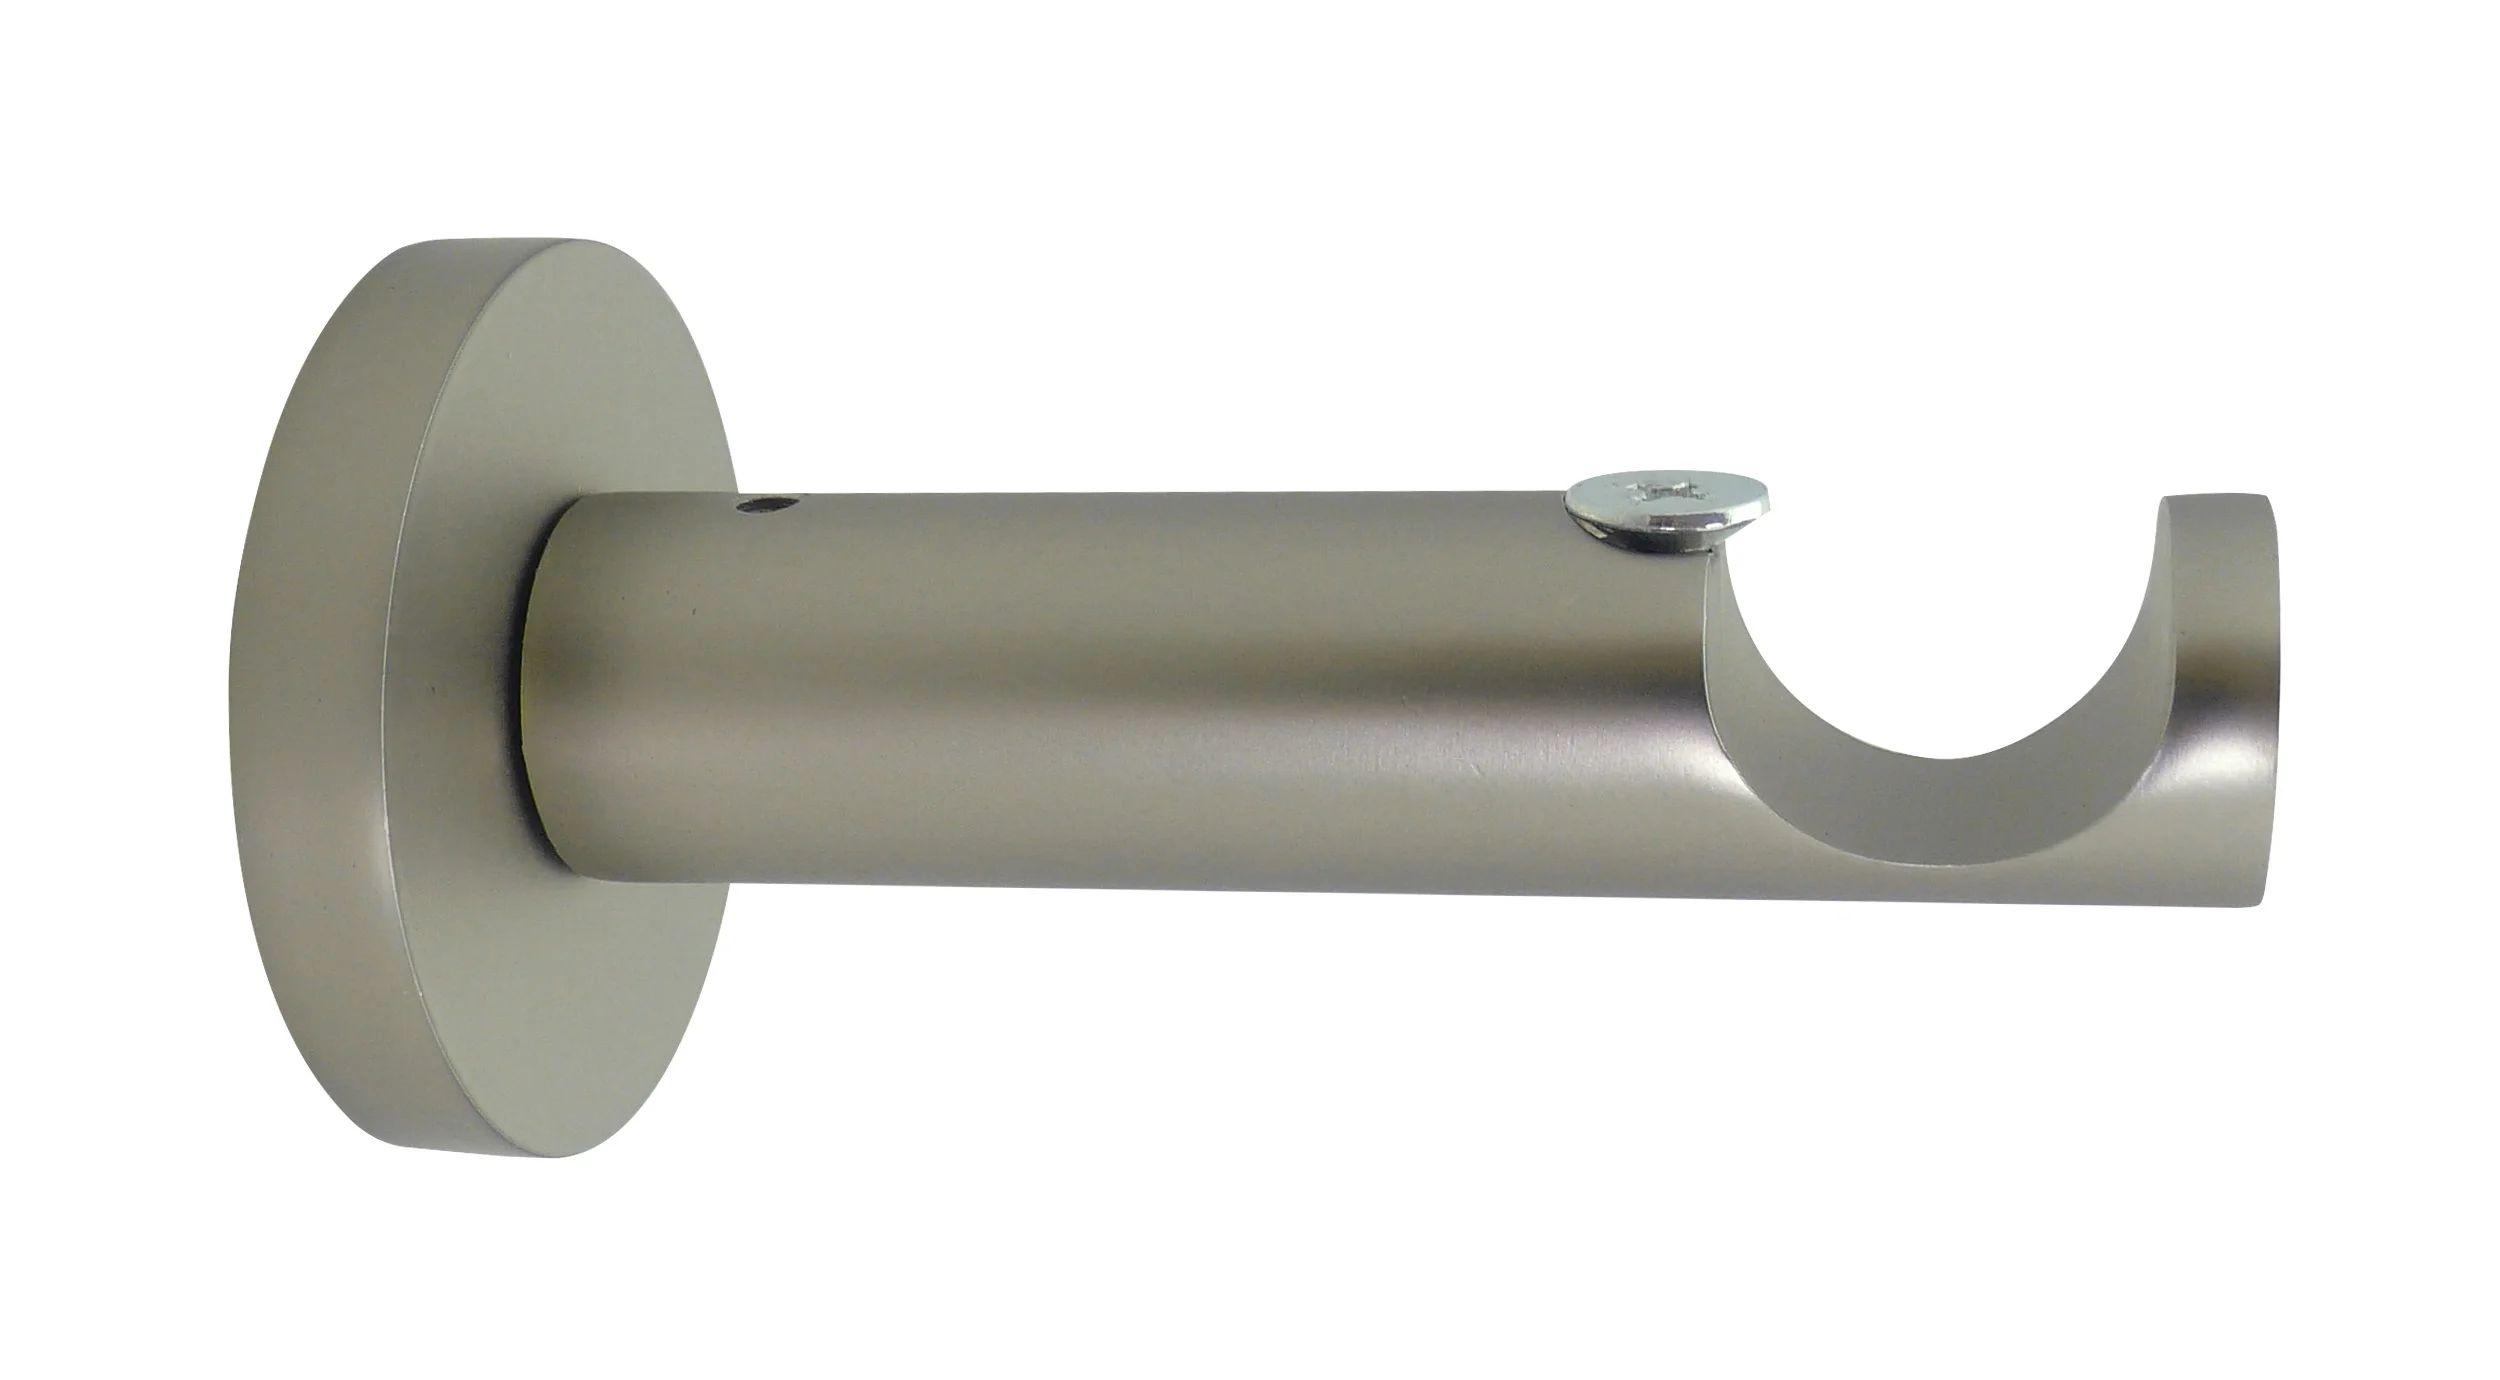 lot de 2 supports tringle a rideau design 20 mm nickel mat inspire